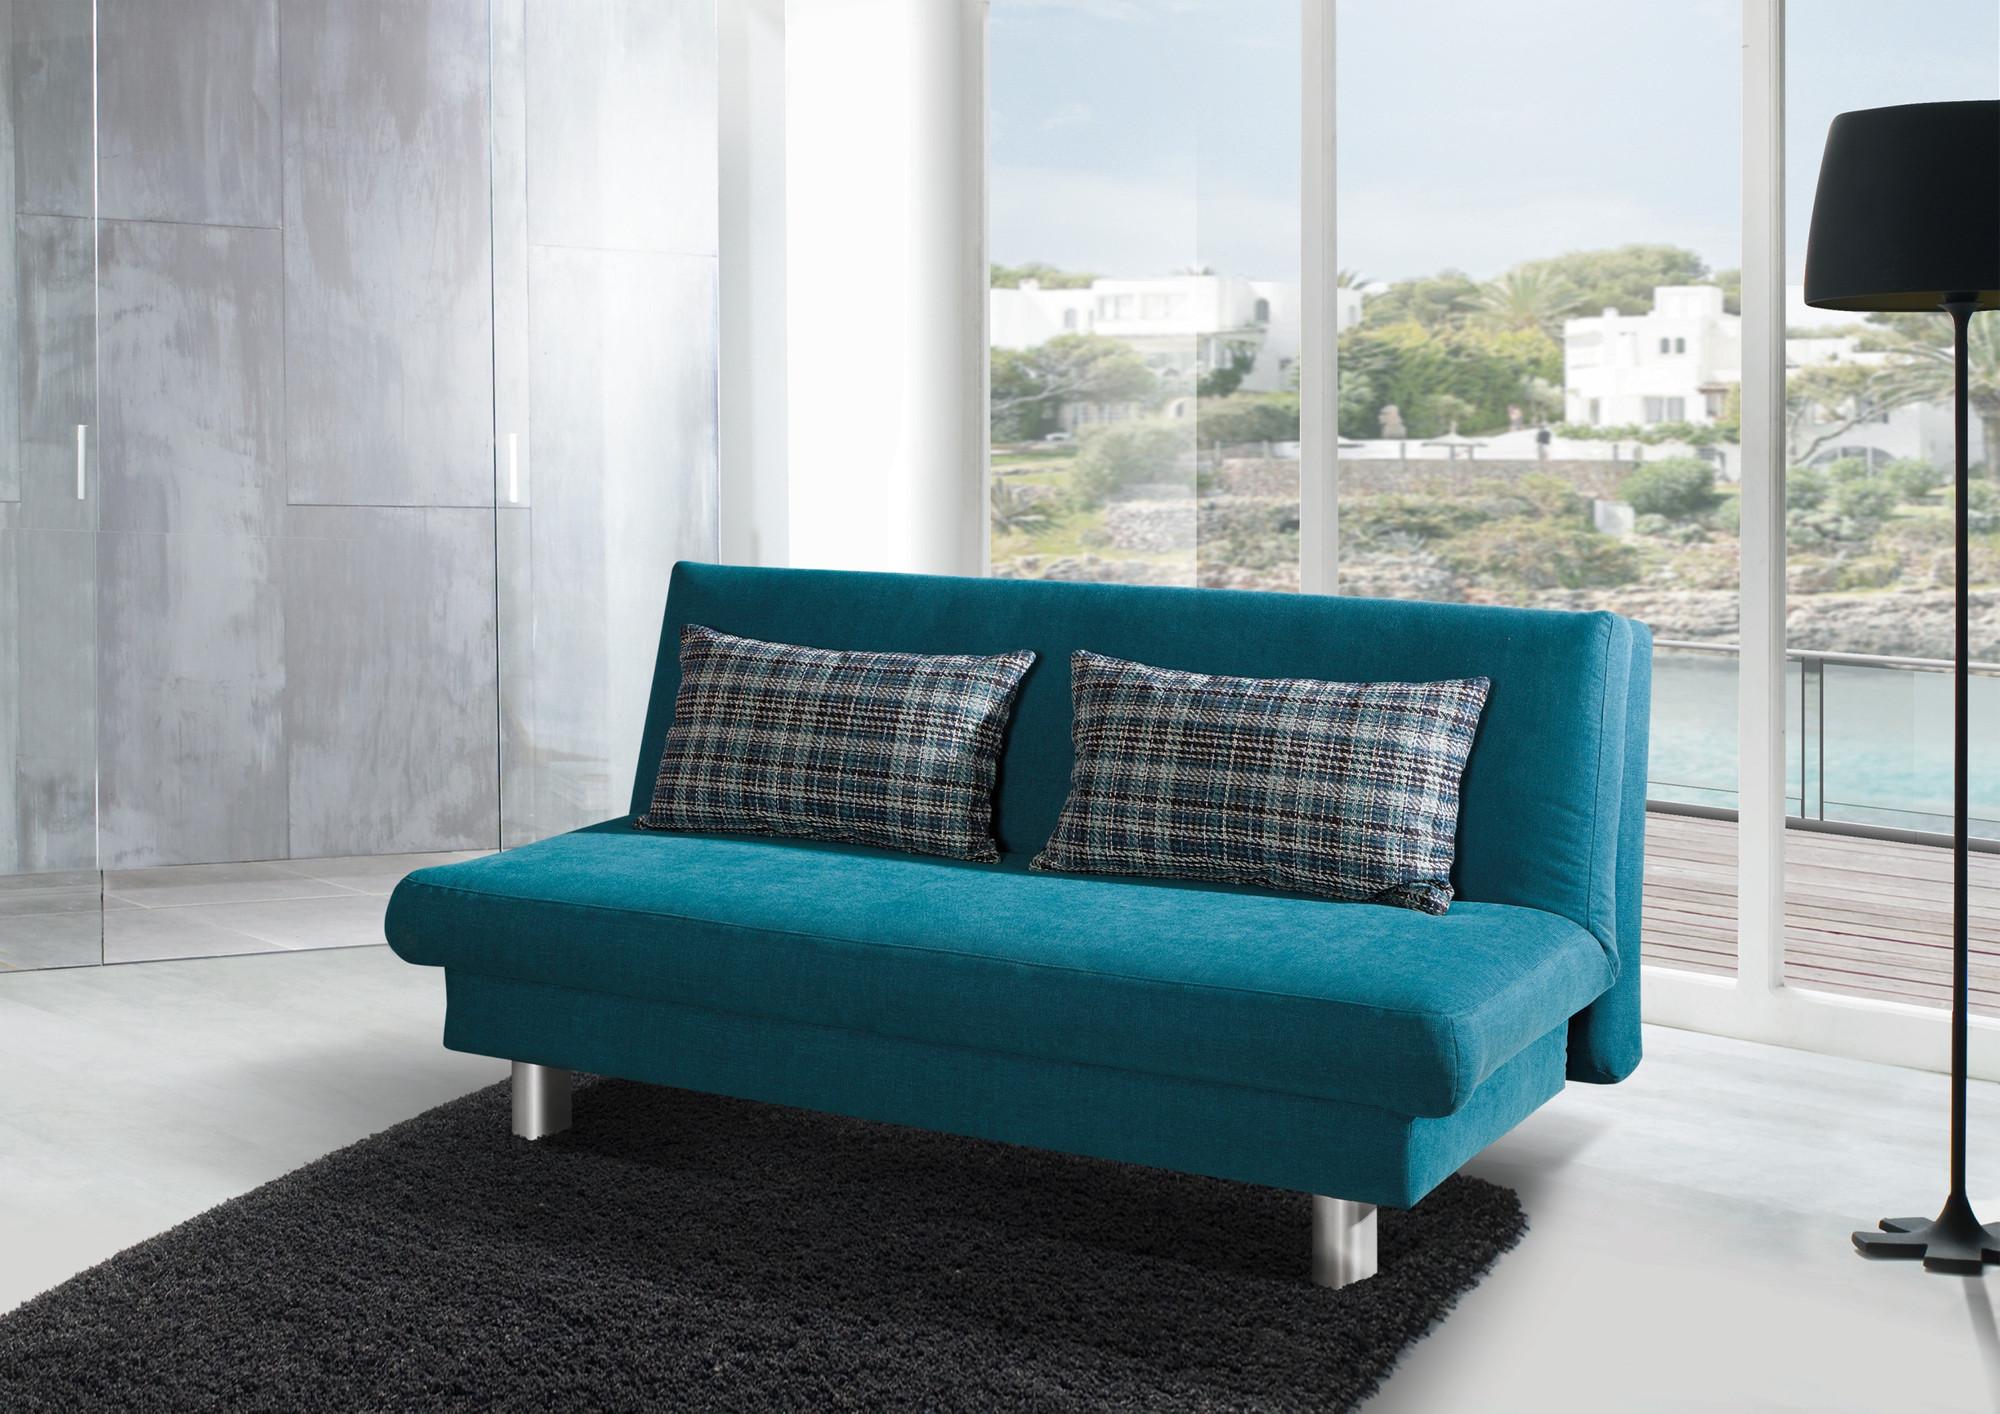 schlafsofa jill 140x202 von restyl. Black Bedroom Furniture Sets. Home Design Ideas